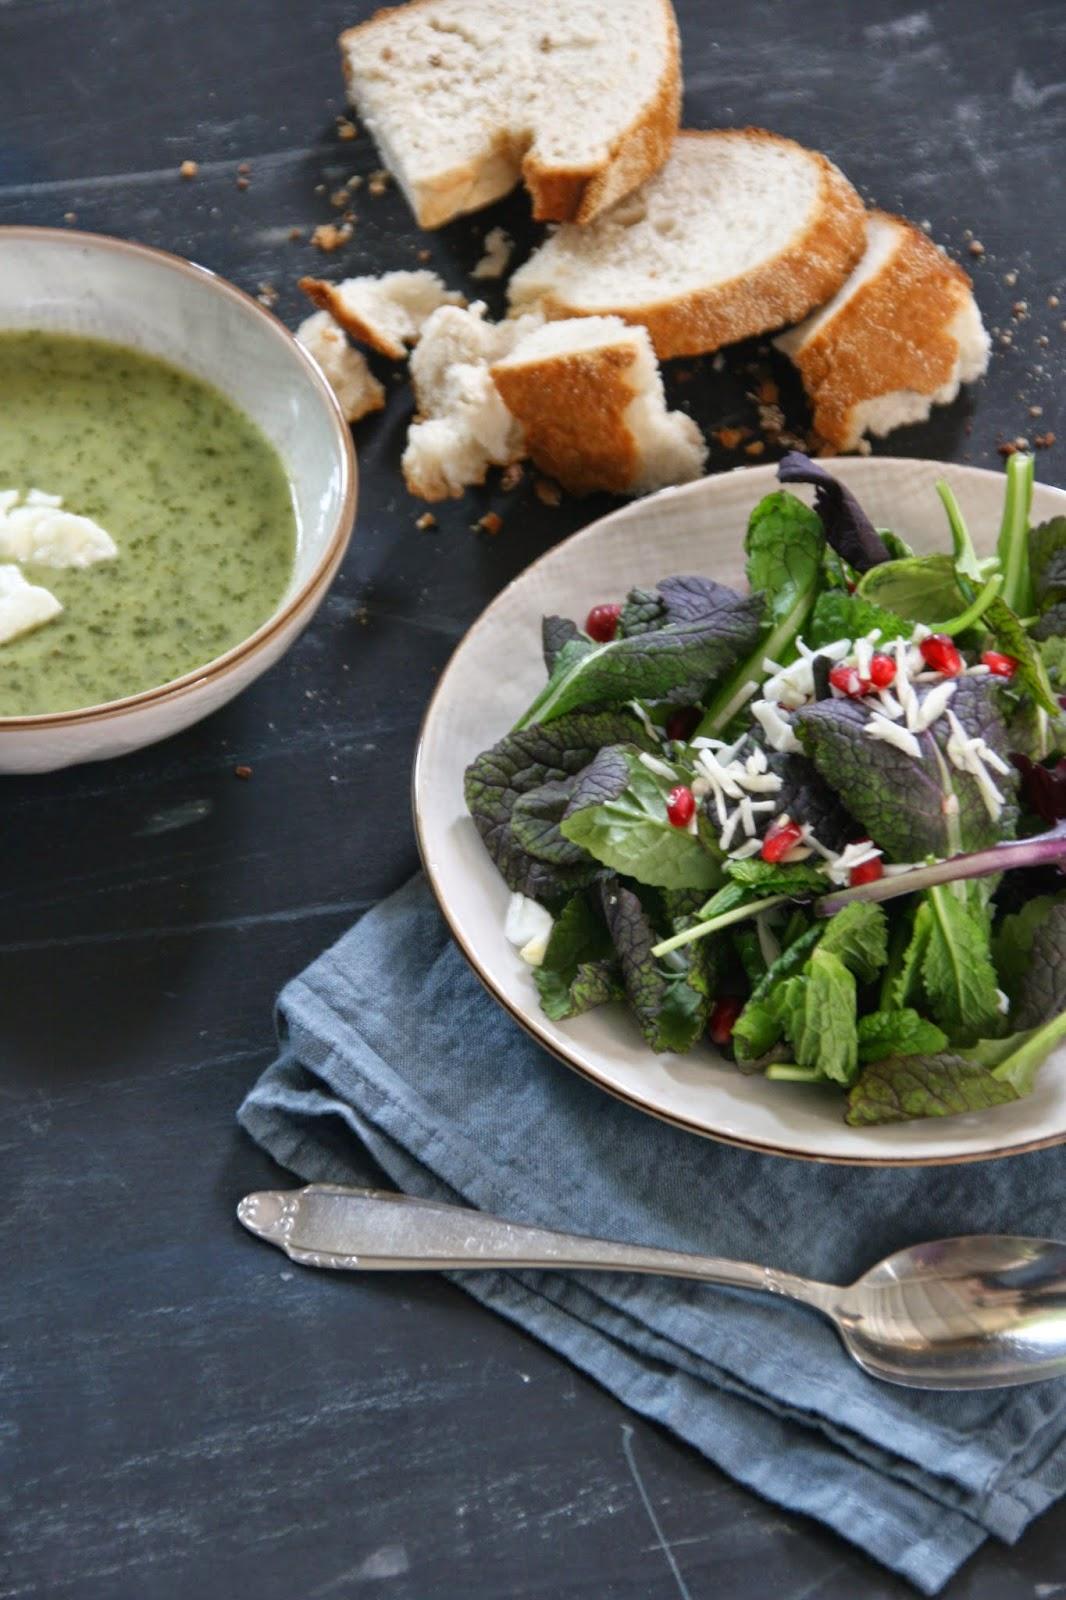 Workshop foodfotografie & styling soep en salade